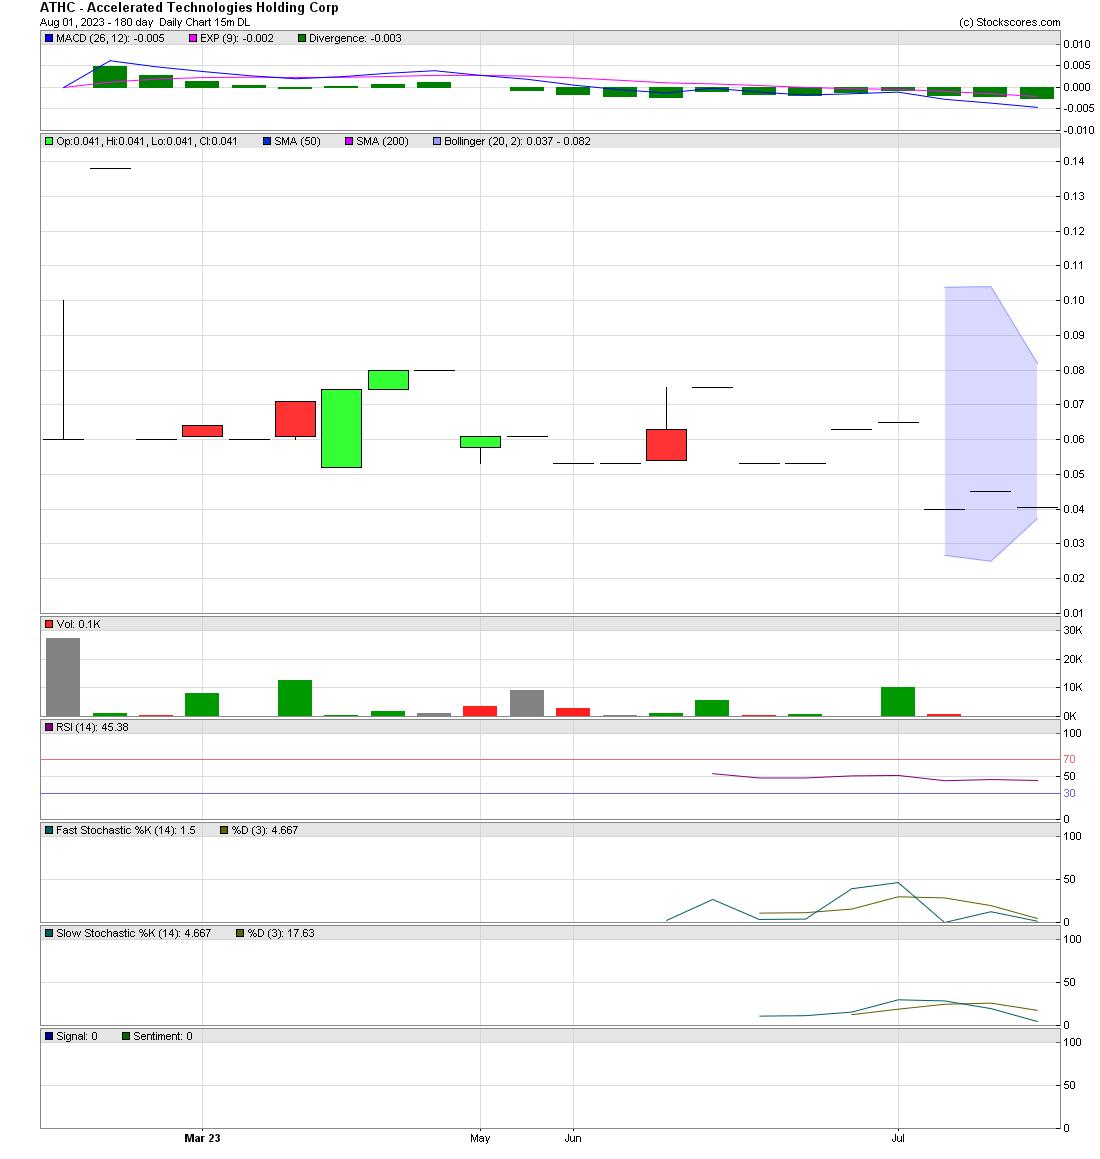 $ATHC chart